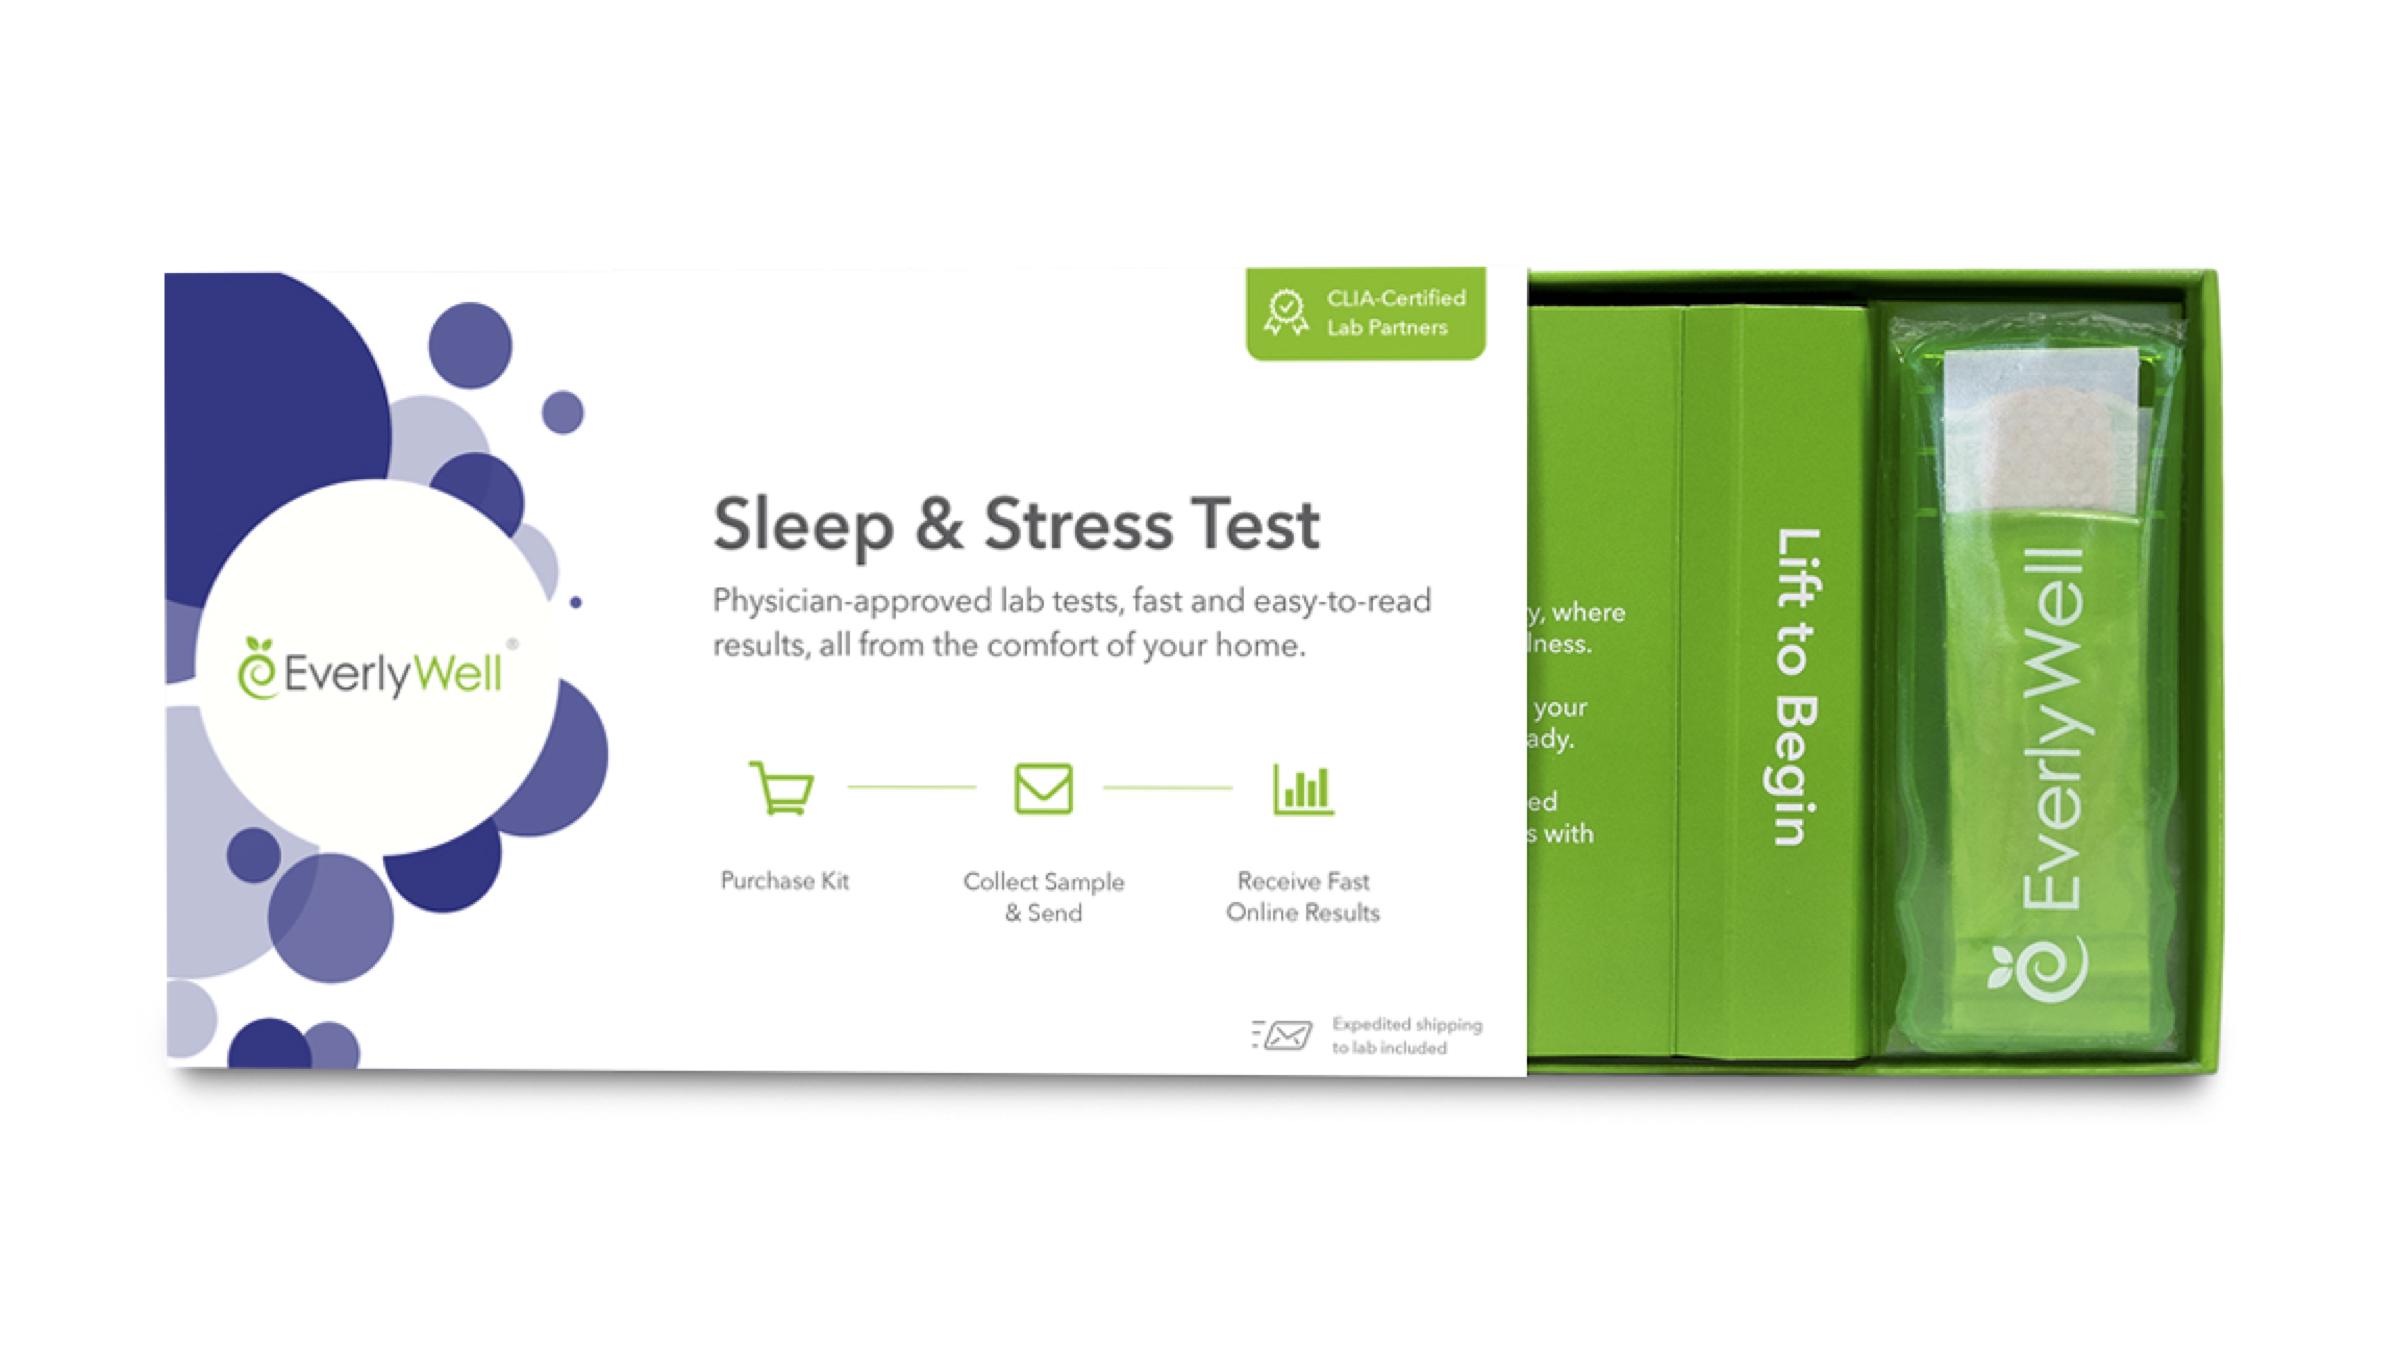 Sleepstresstestopenbox